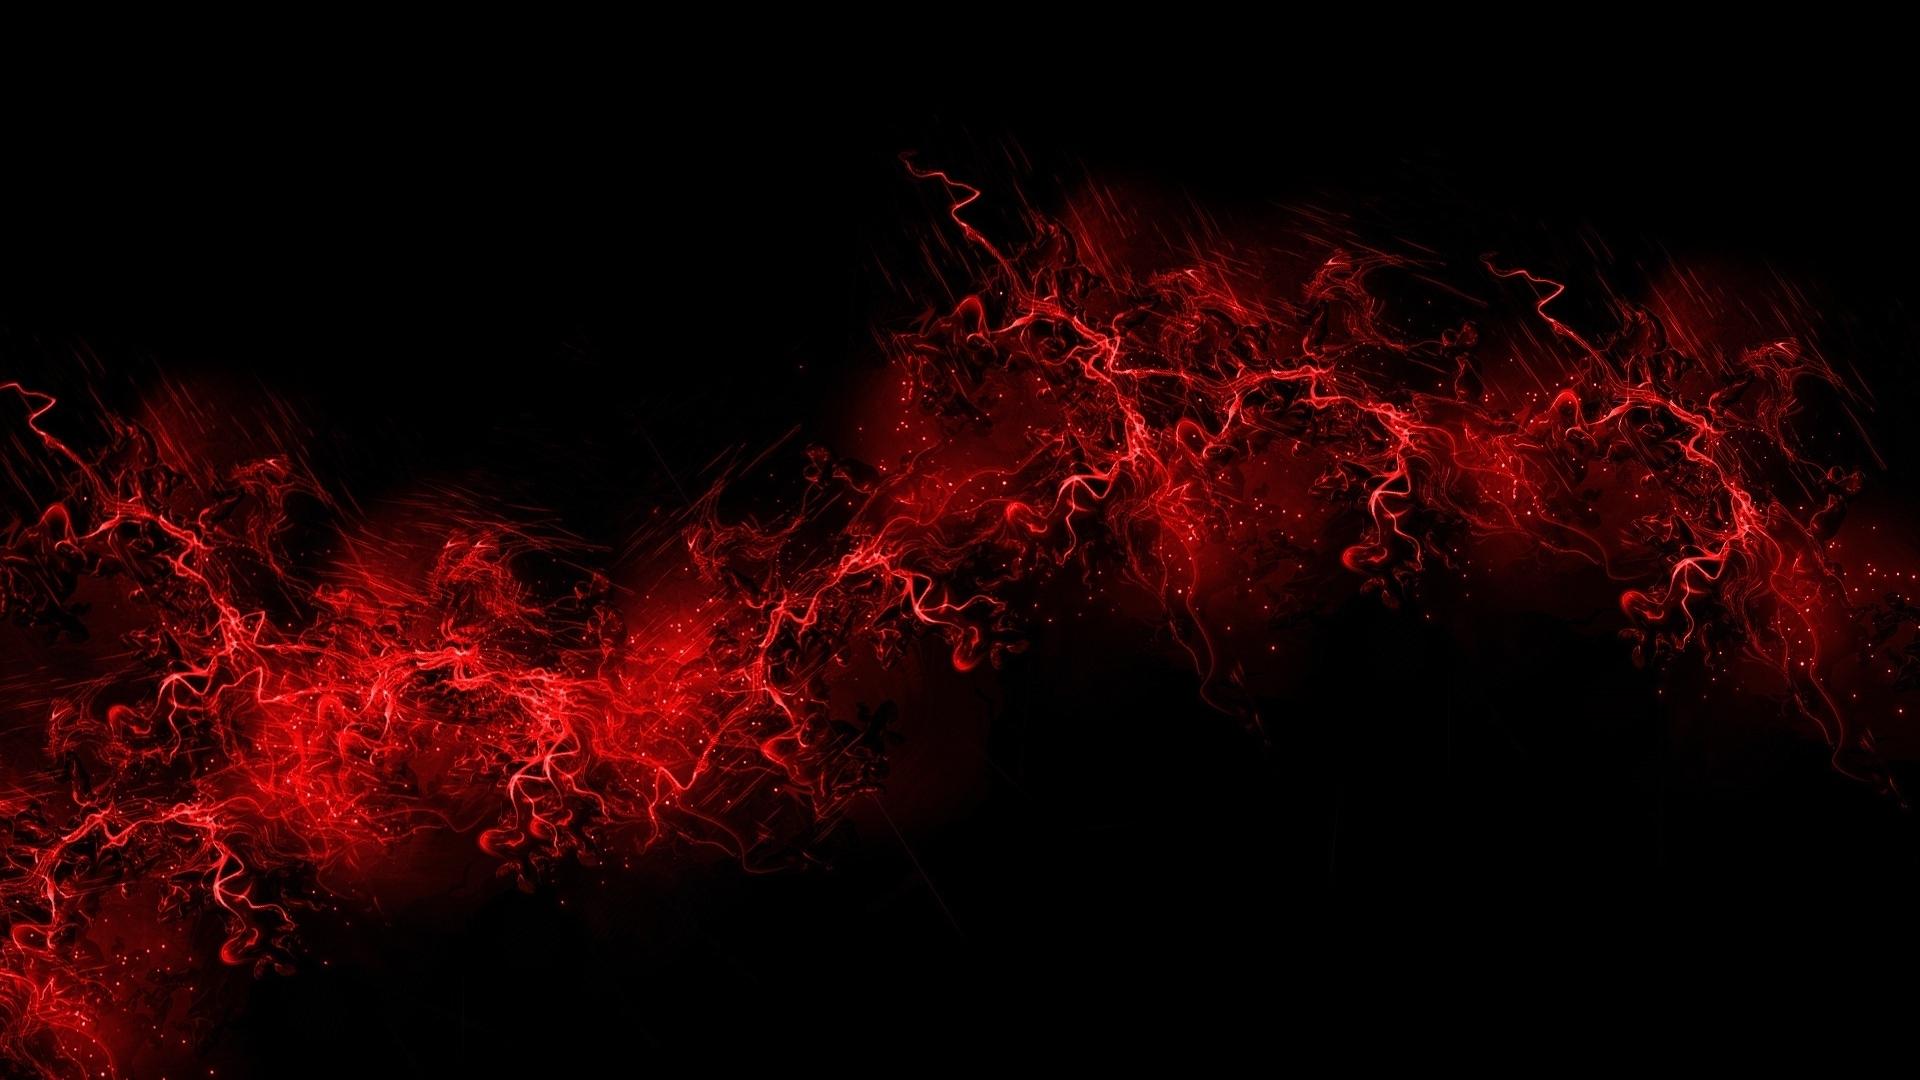 black abstract red effect wallpaper - baltana